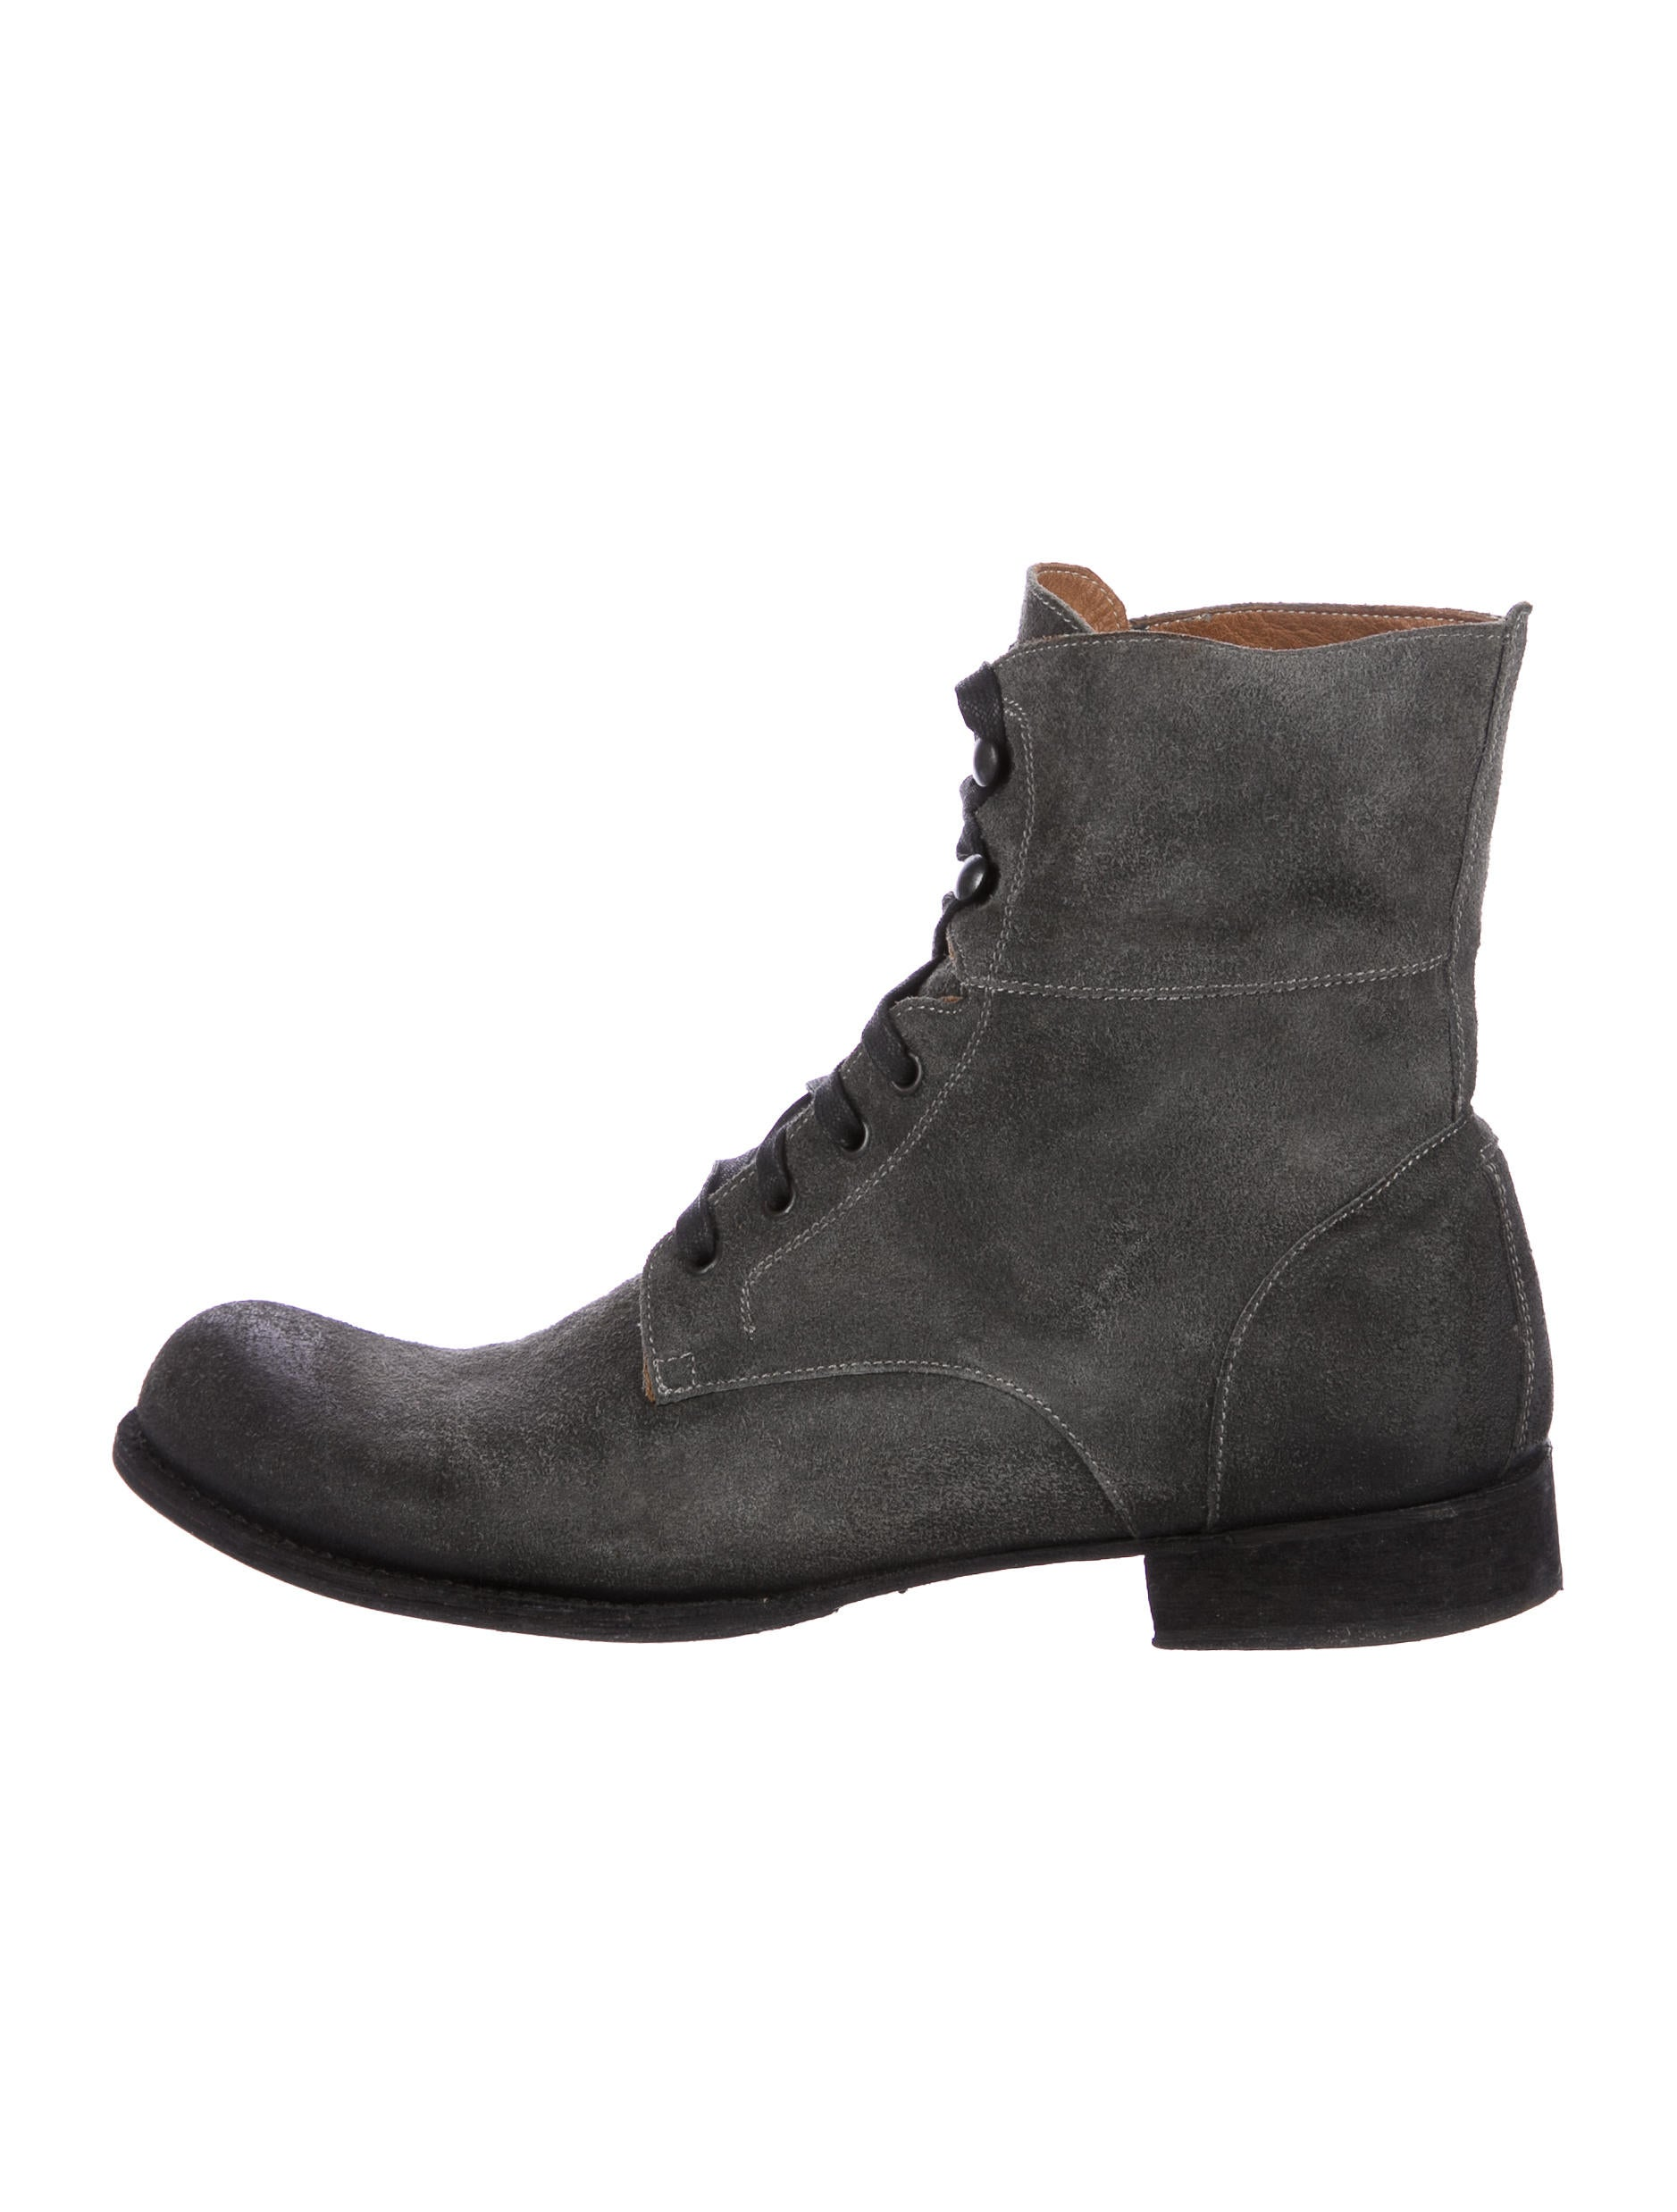 varvatos suede distressed boots shoes jva24188